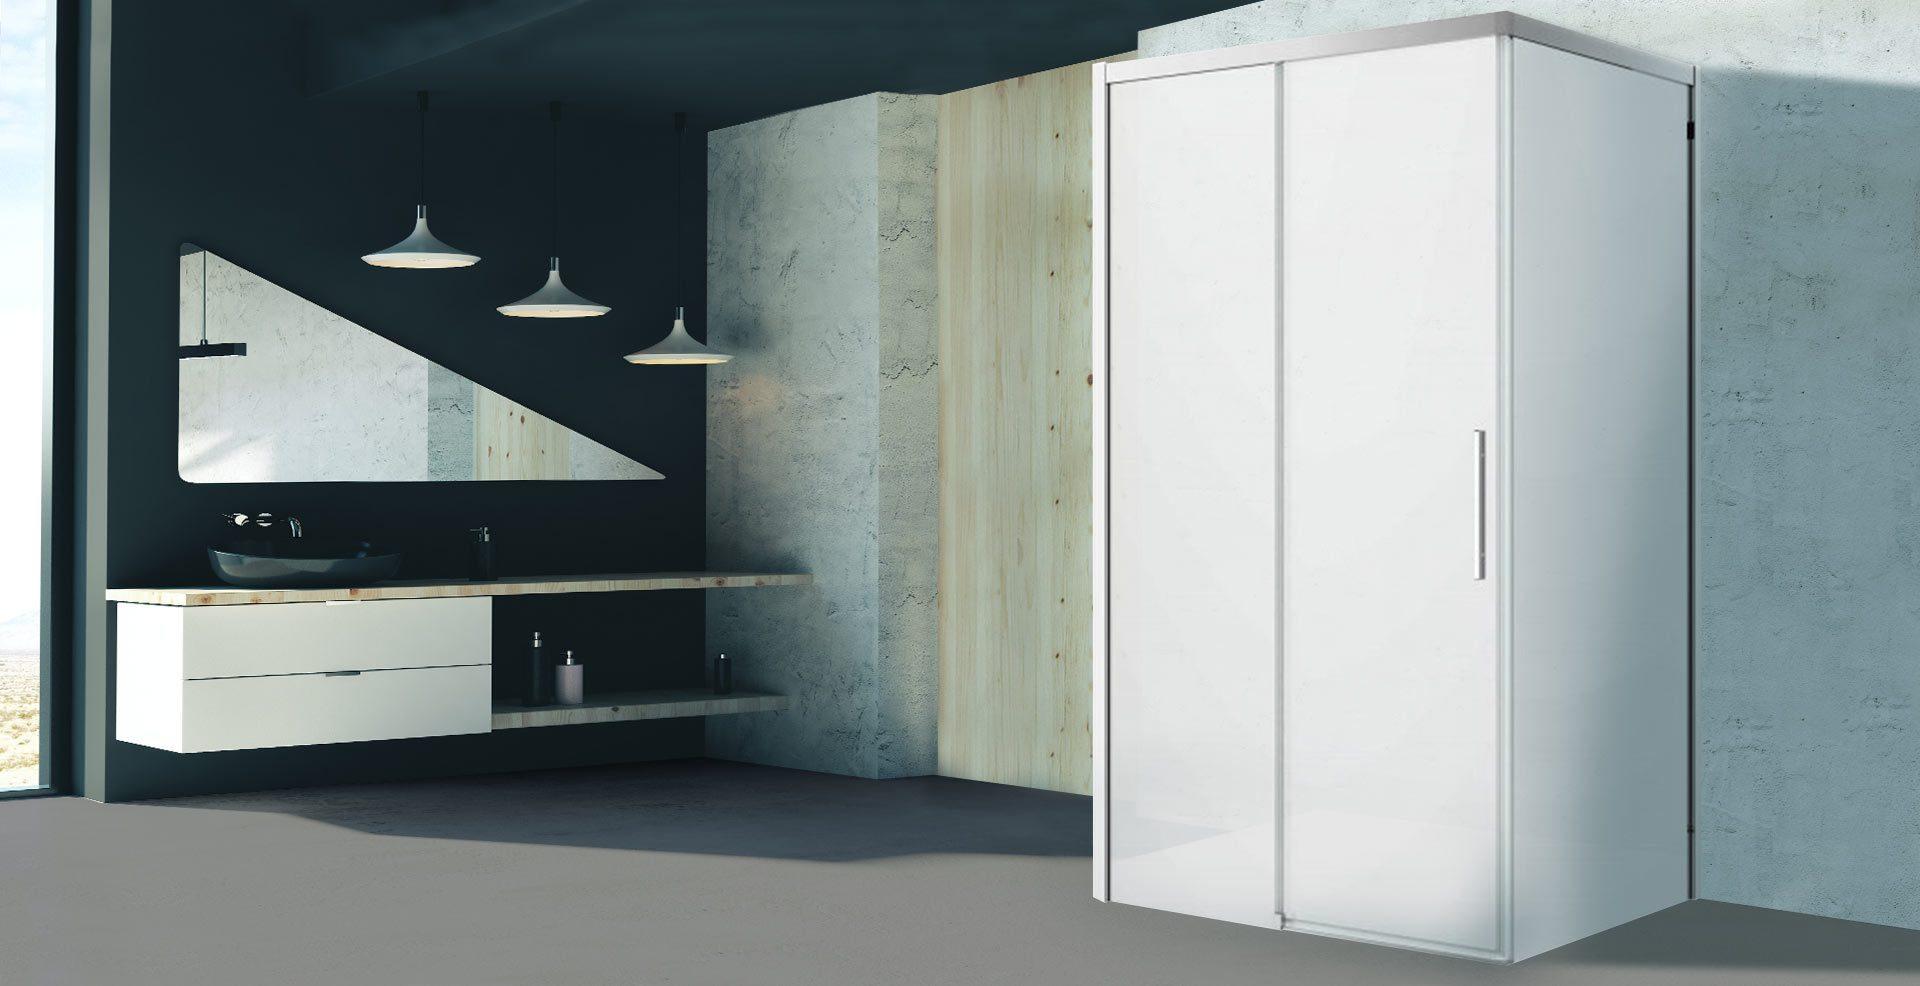 1200x900mm Sliding Shower Enclosure